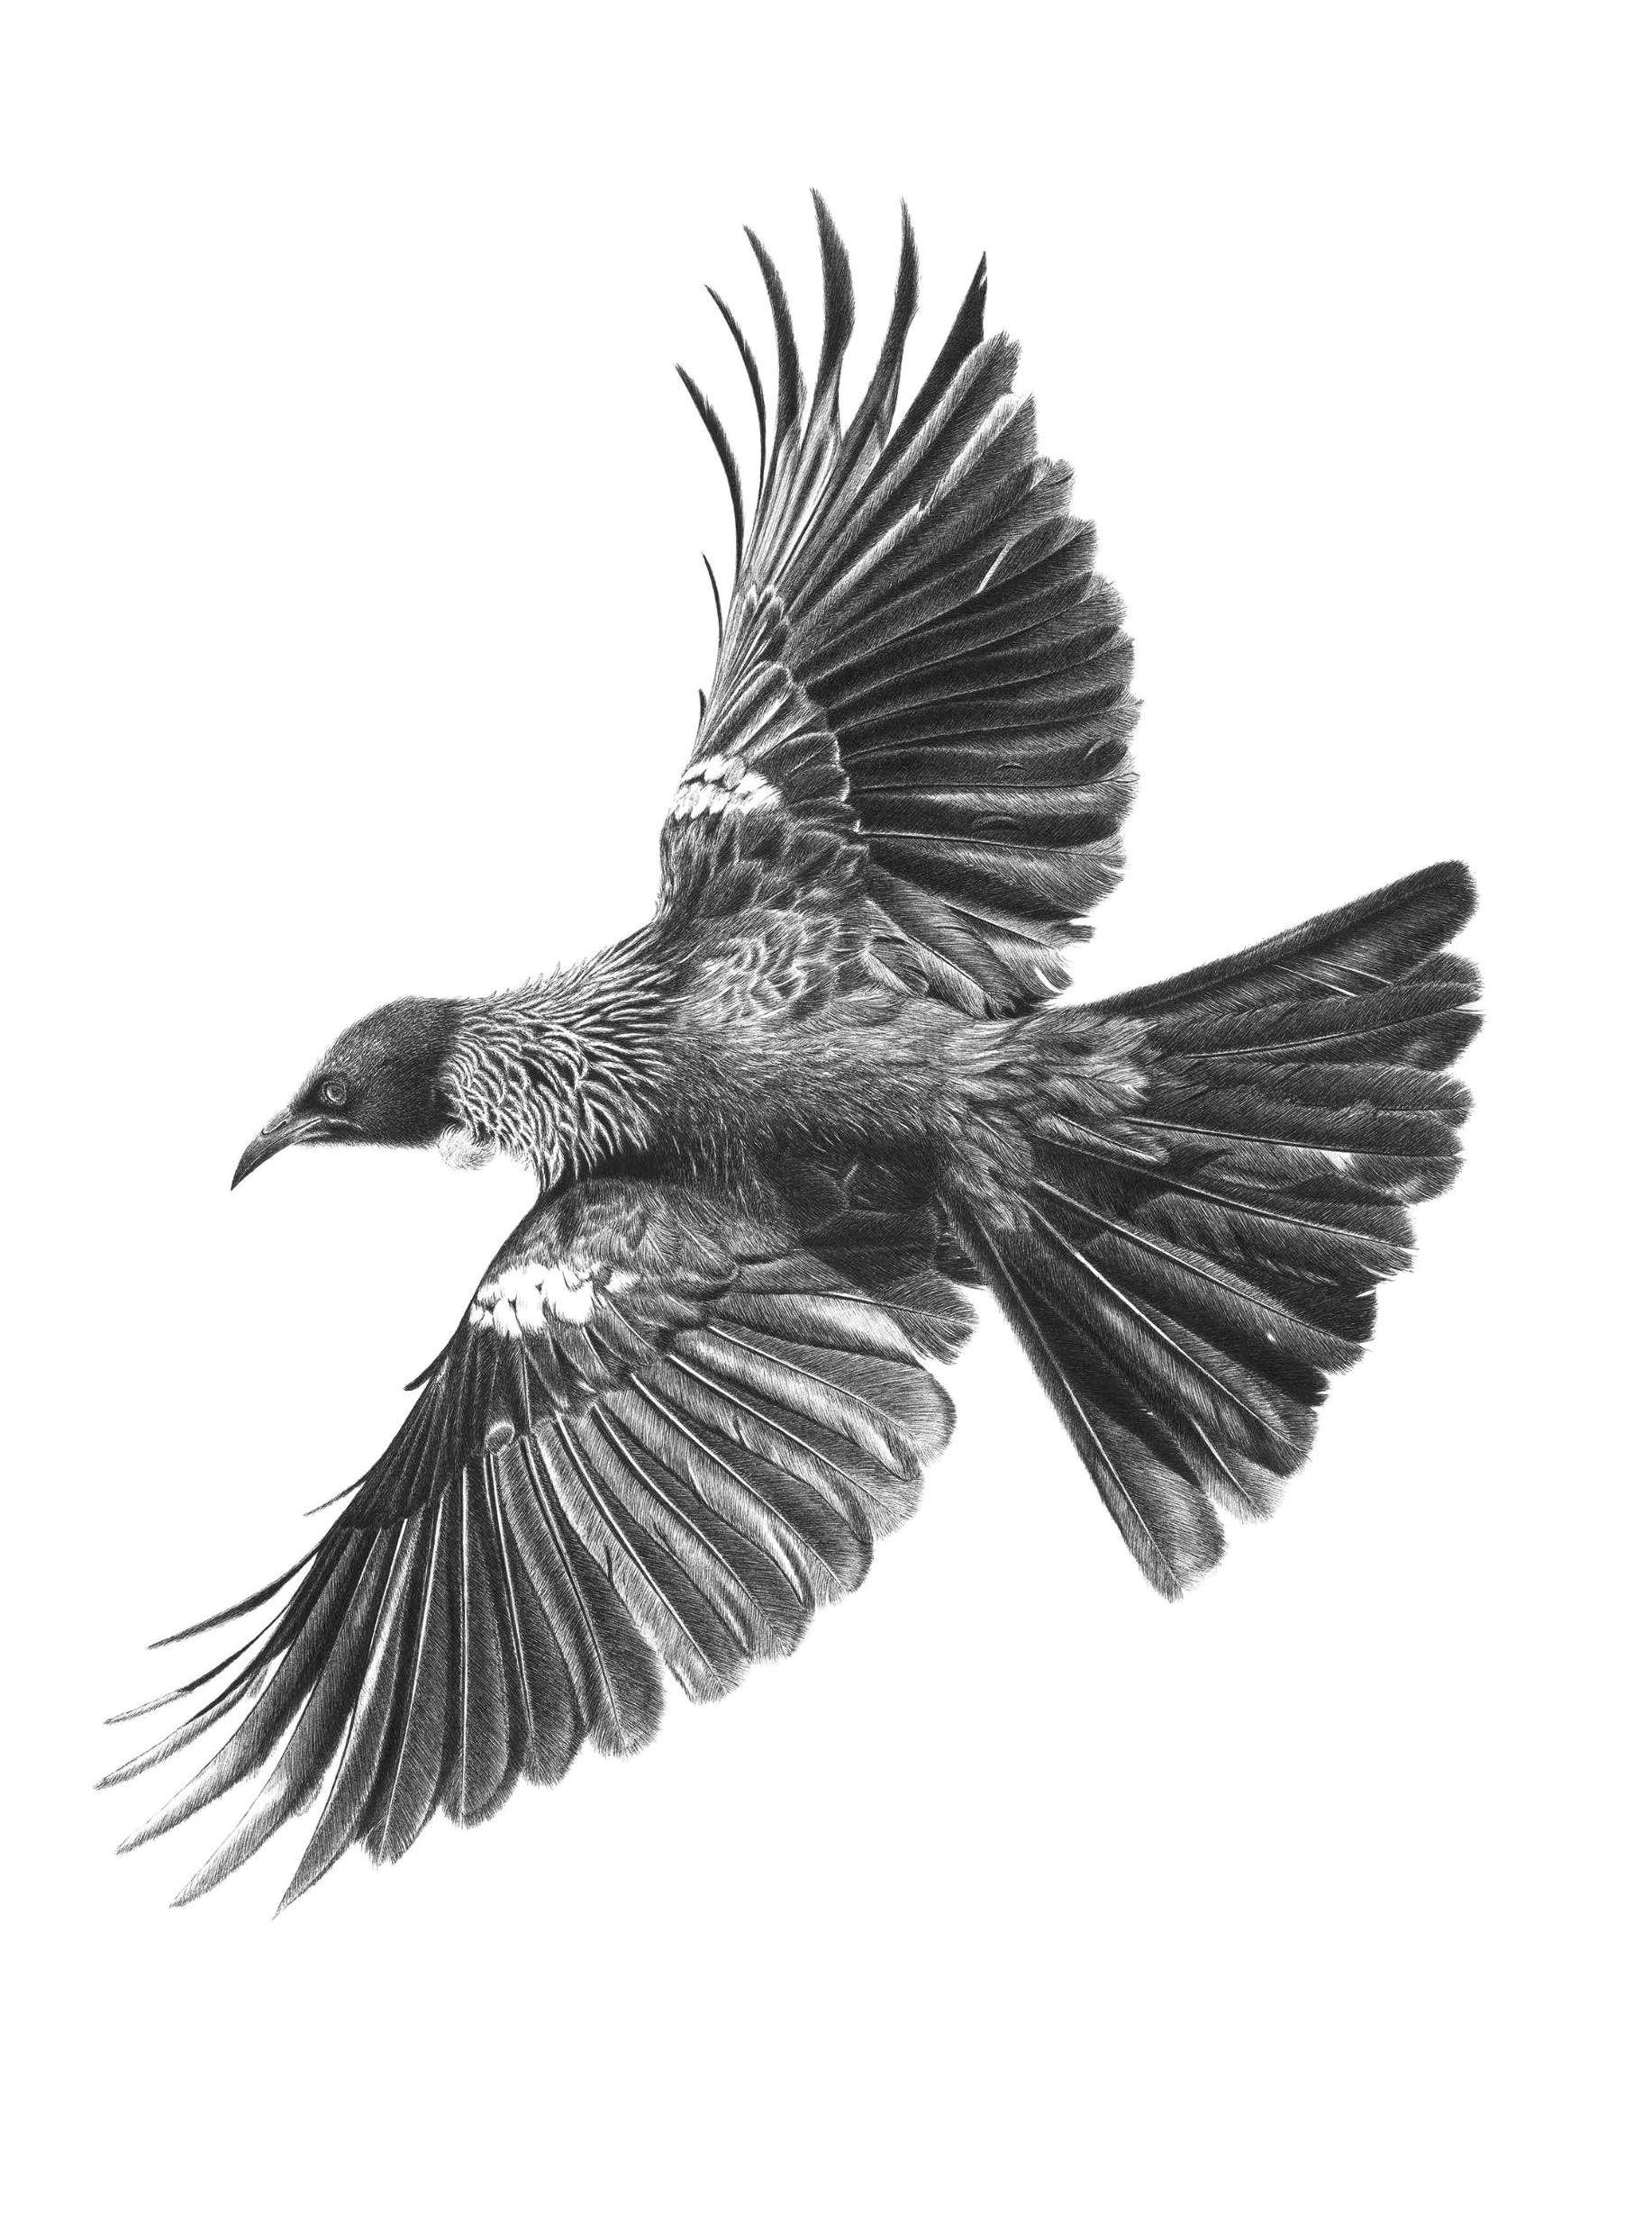 Tui Artwork Flying free.jpg